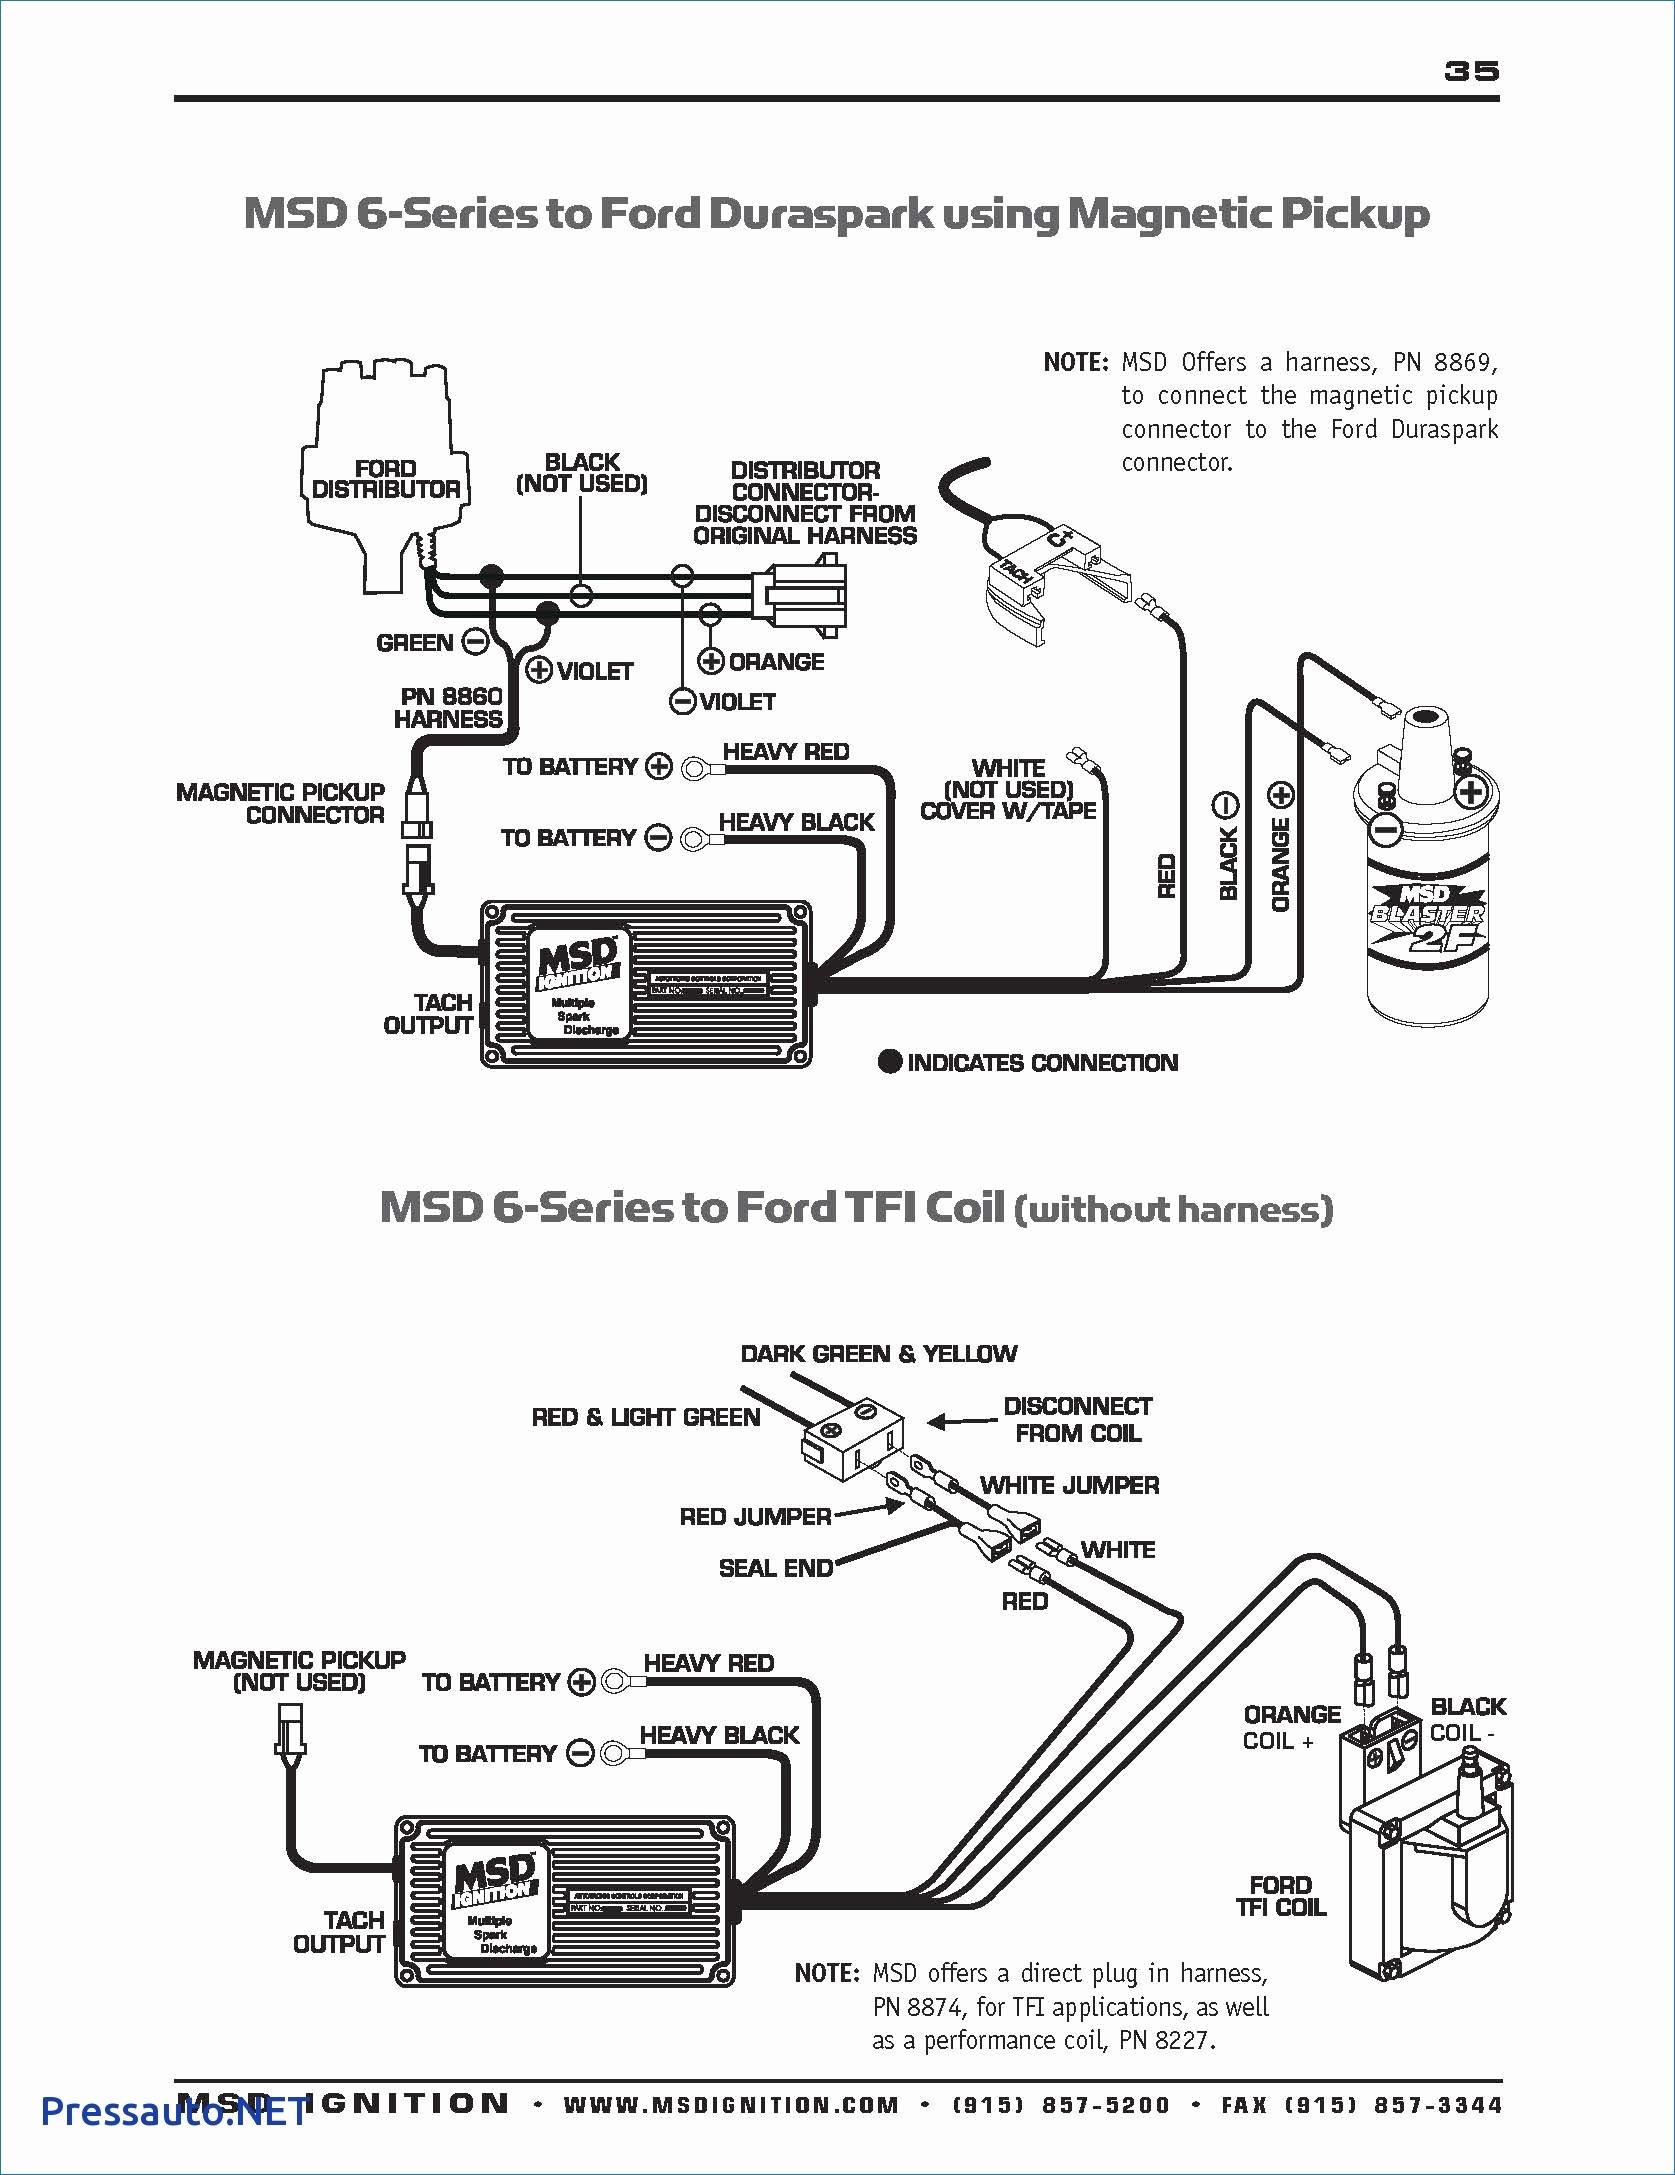 Msd 6Al Wiring Diagram For Chevy 350 Small Block | Wiring Library - Msd Digital 6 Plus Wiring Diagram